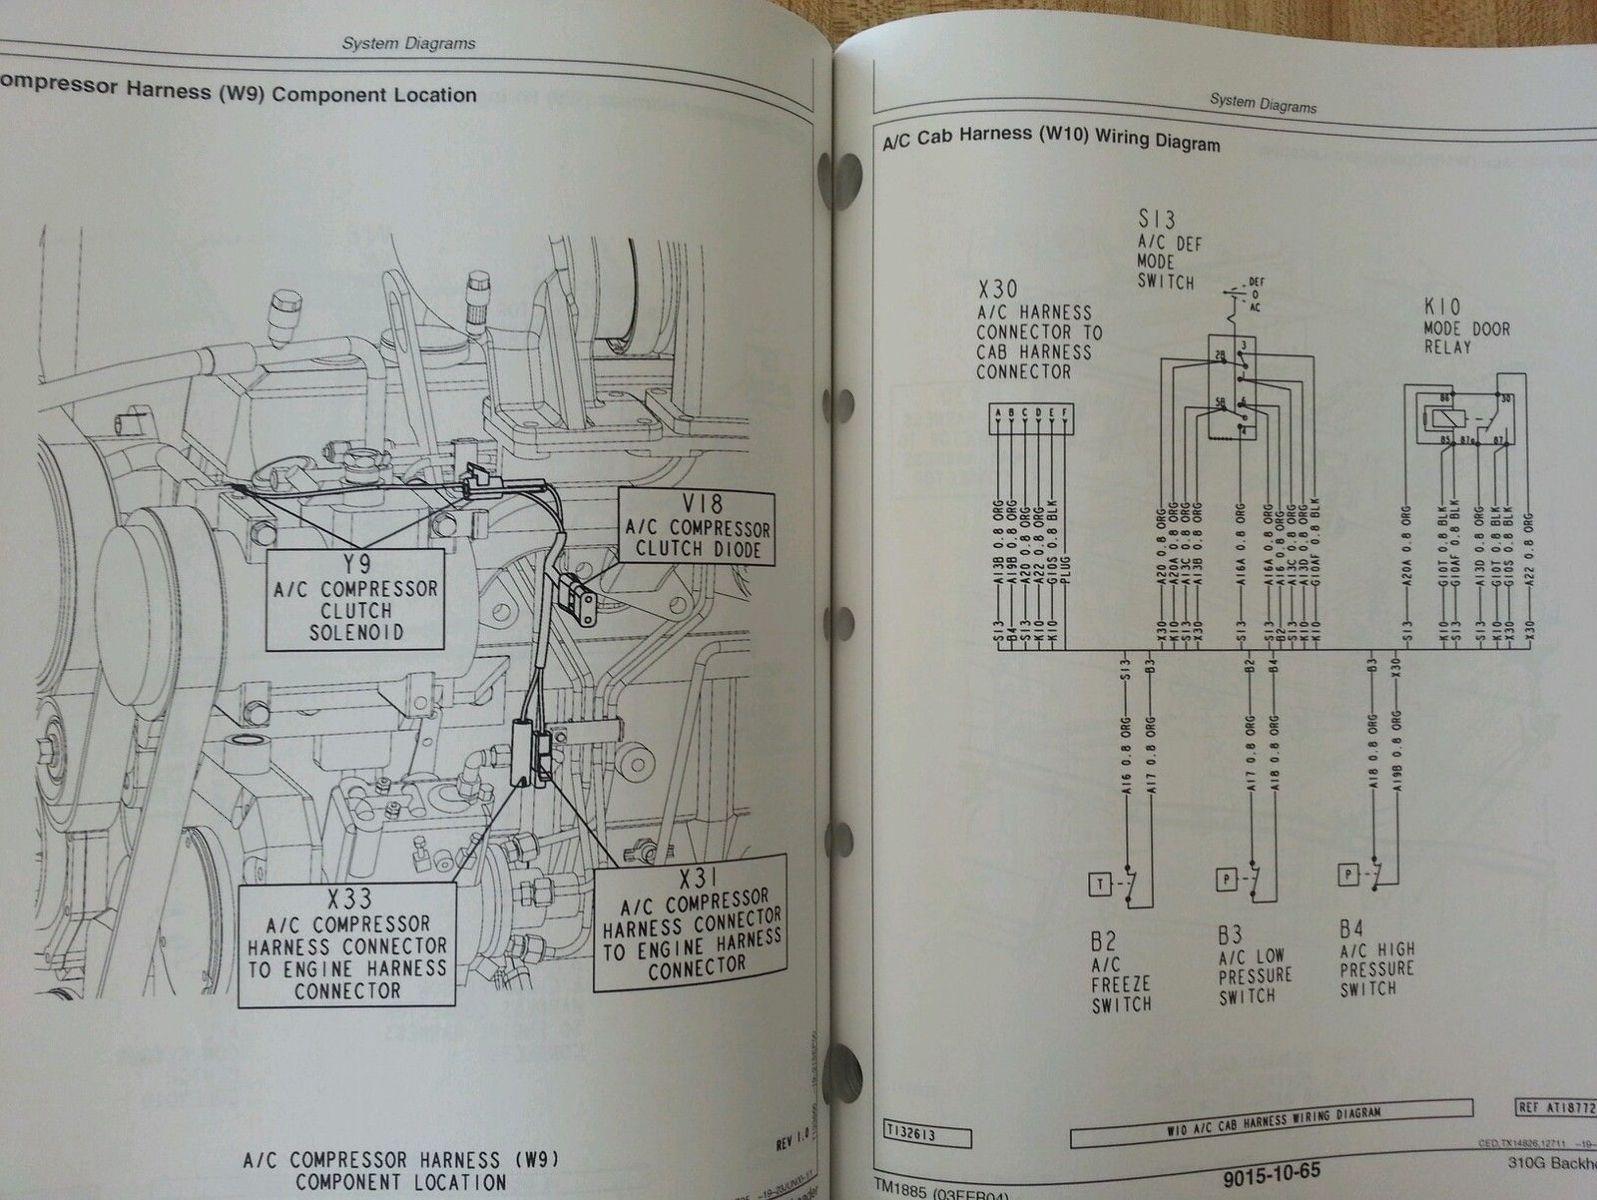 Service Manual Wiring Diagram Get Free Image About Wiring Diagram